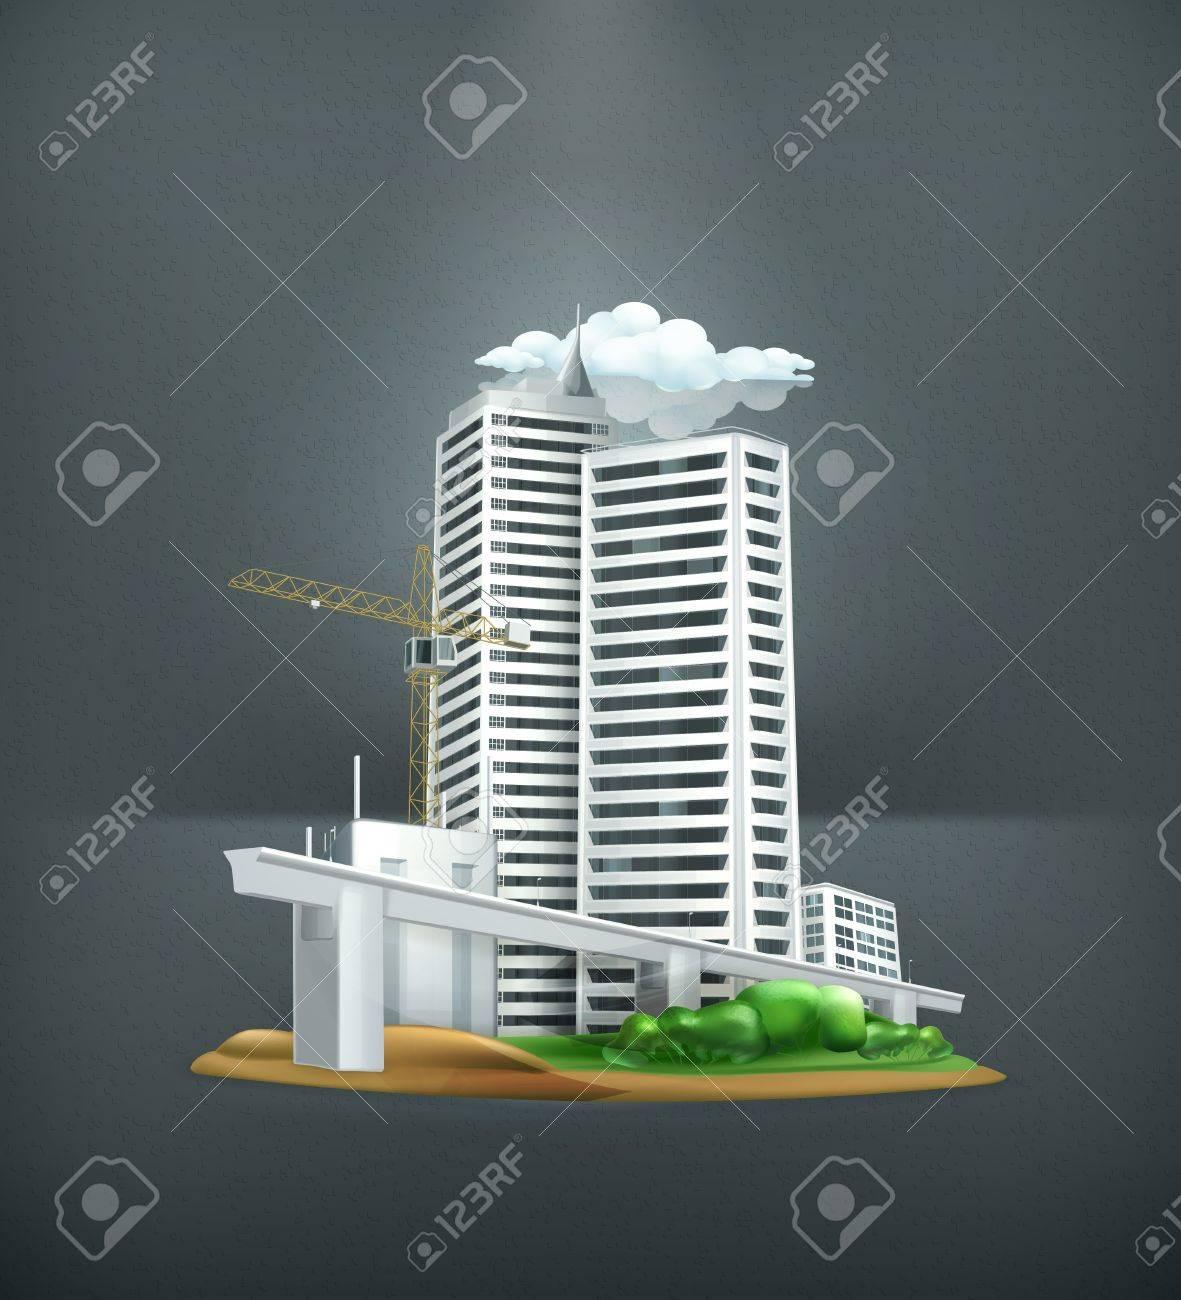 Construction Stock Vector - 19346824